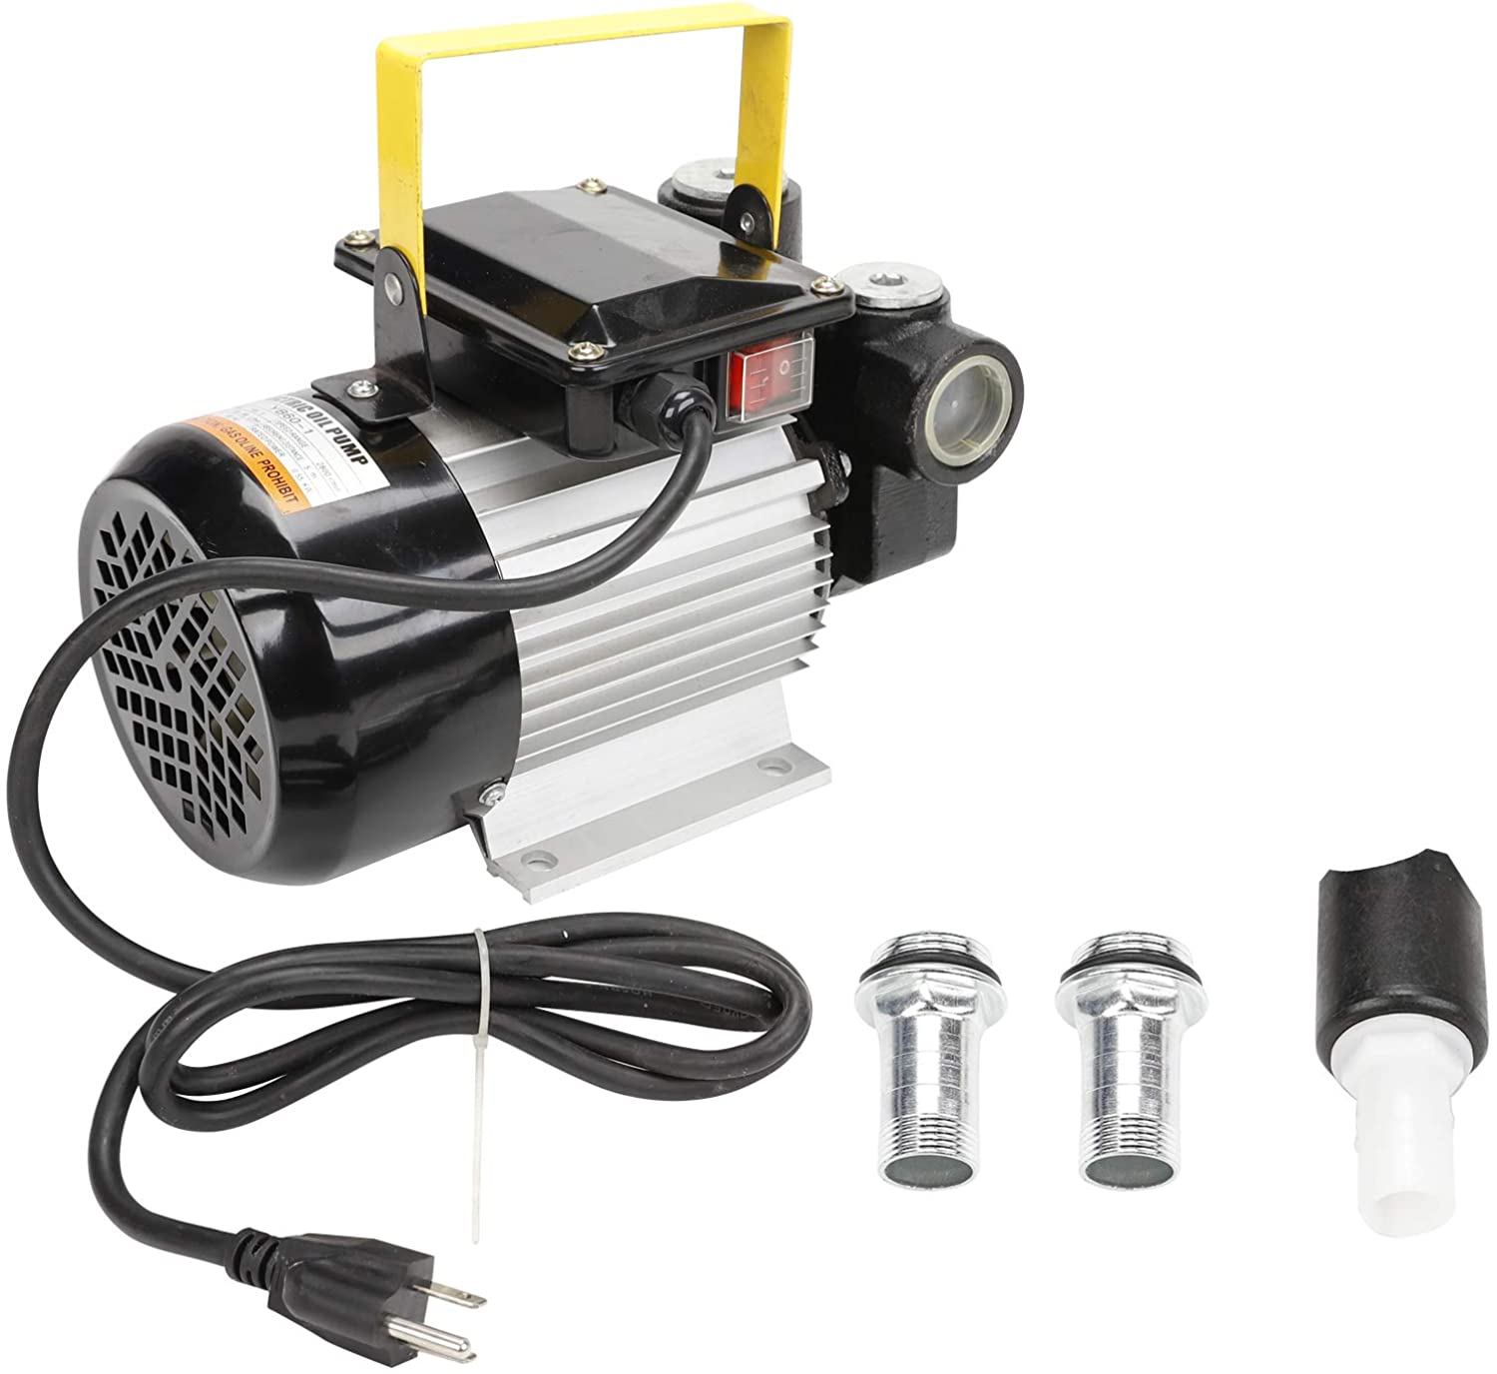 BLACKHORSE-RACING Self Priming 110v Ac 16GPM 60L/min Oil Transfer Pump Fuel Diesel Kerosene Biodiesel Pumps